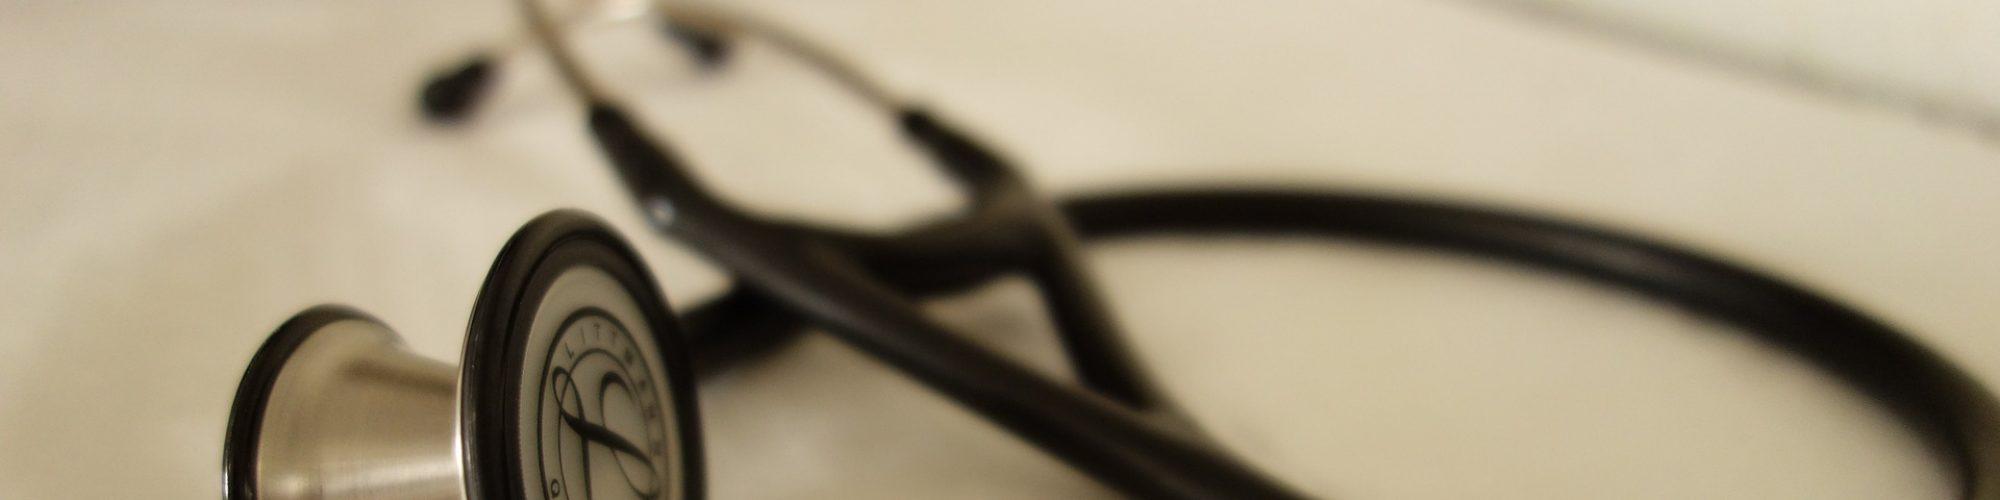 stethoscope-2359757_1920